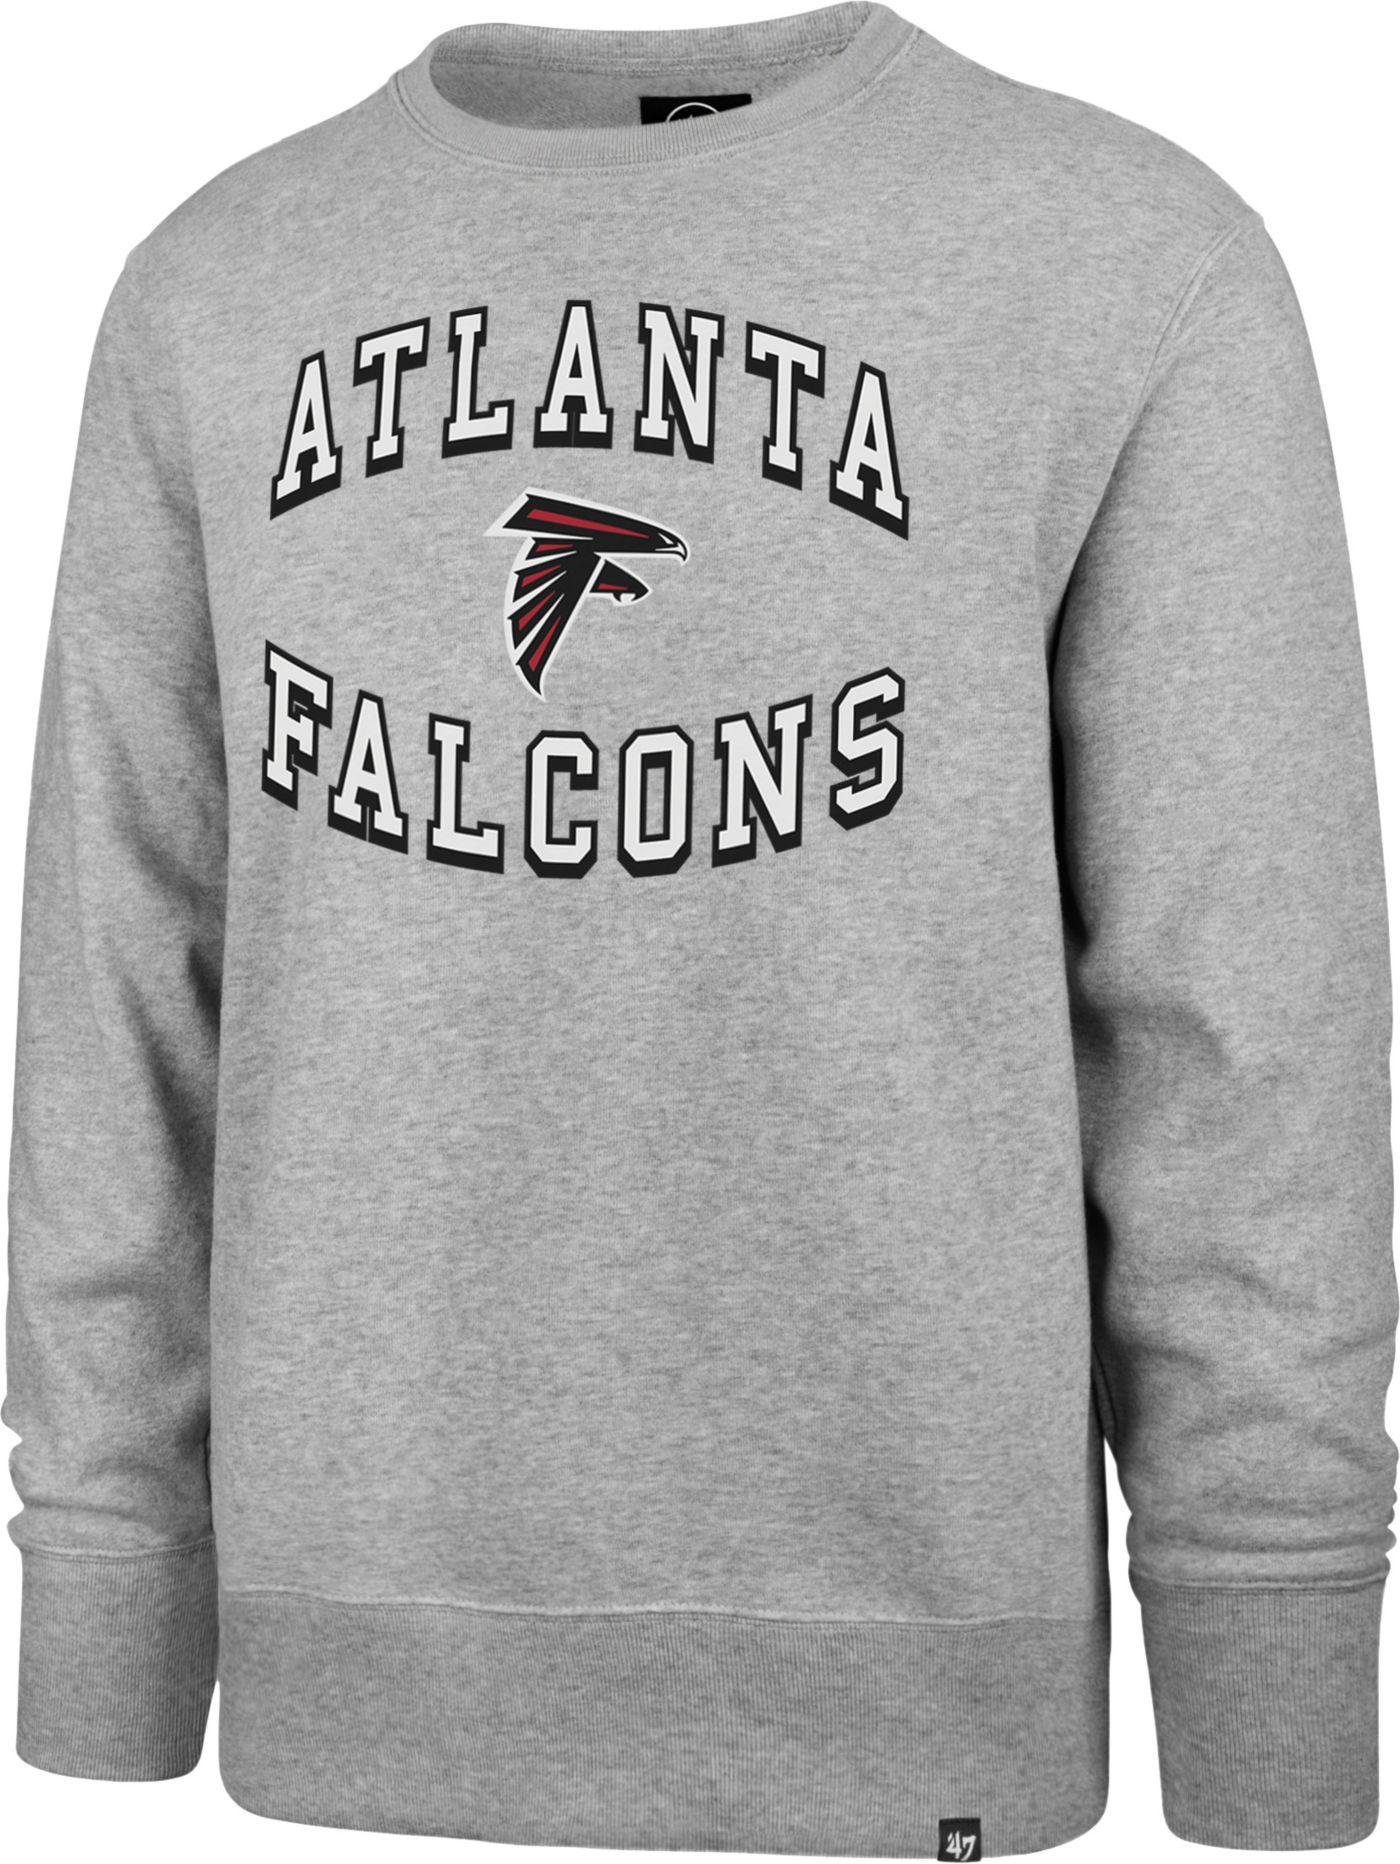 '47 Men's Atlanta Falcons Headline Grey Crew